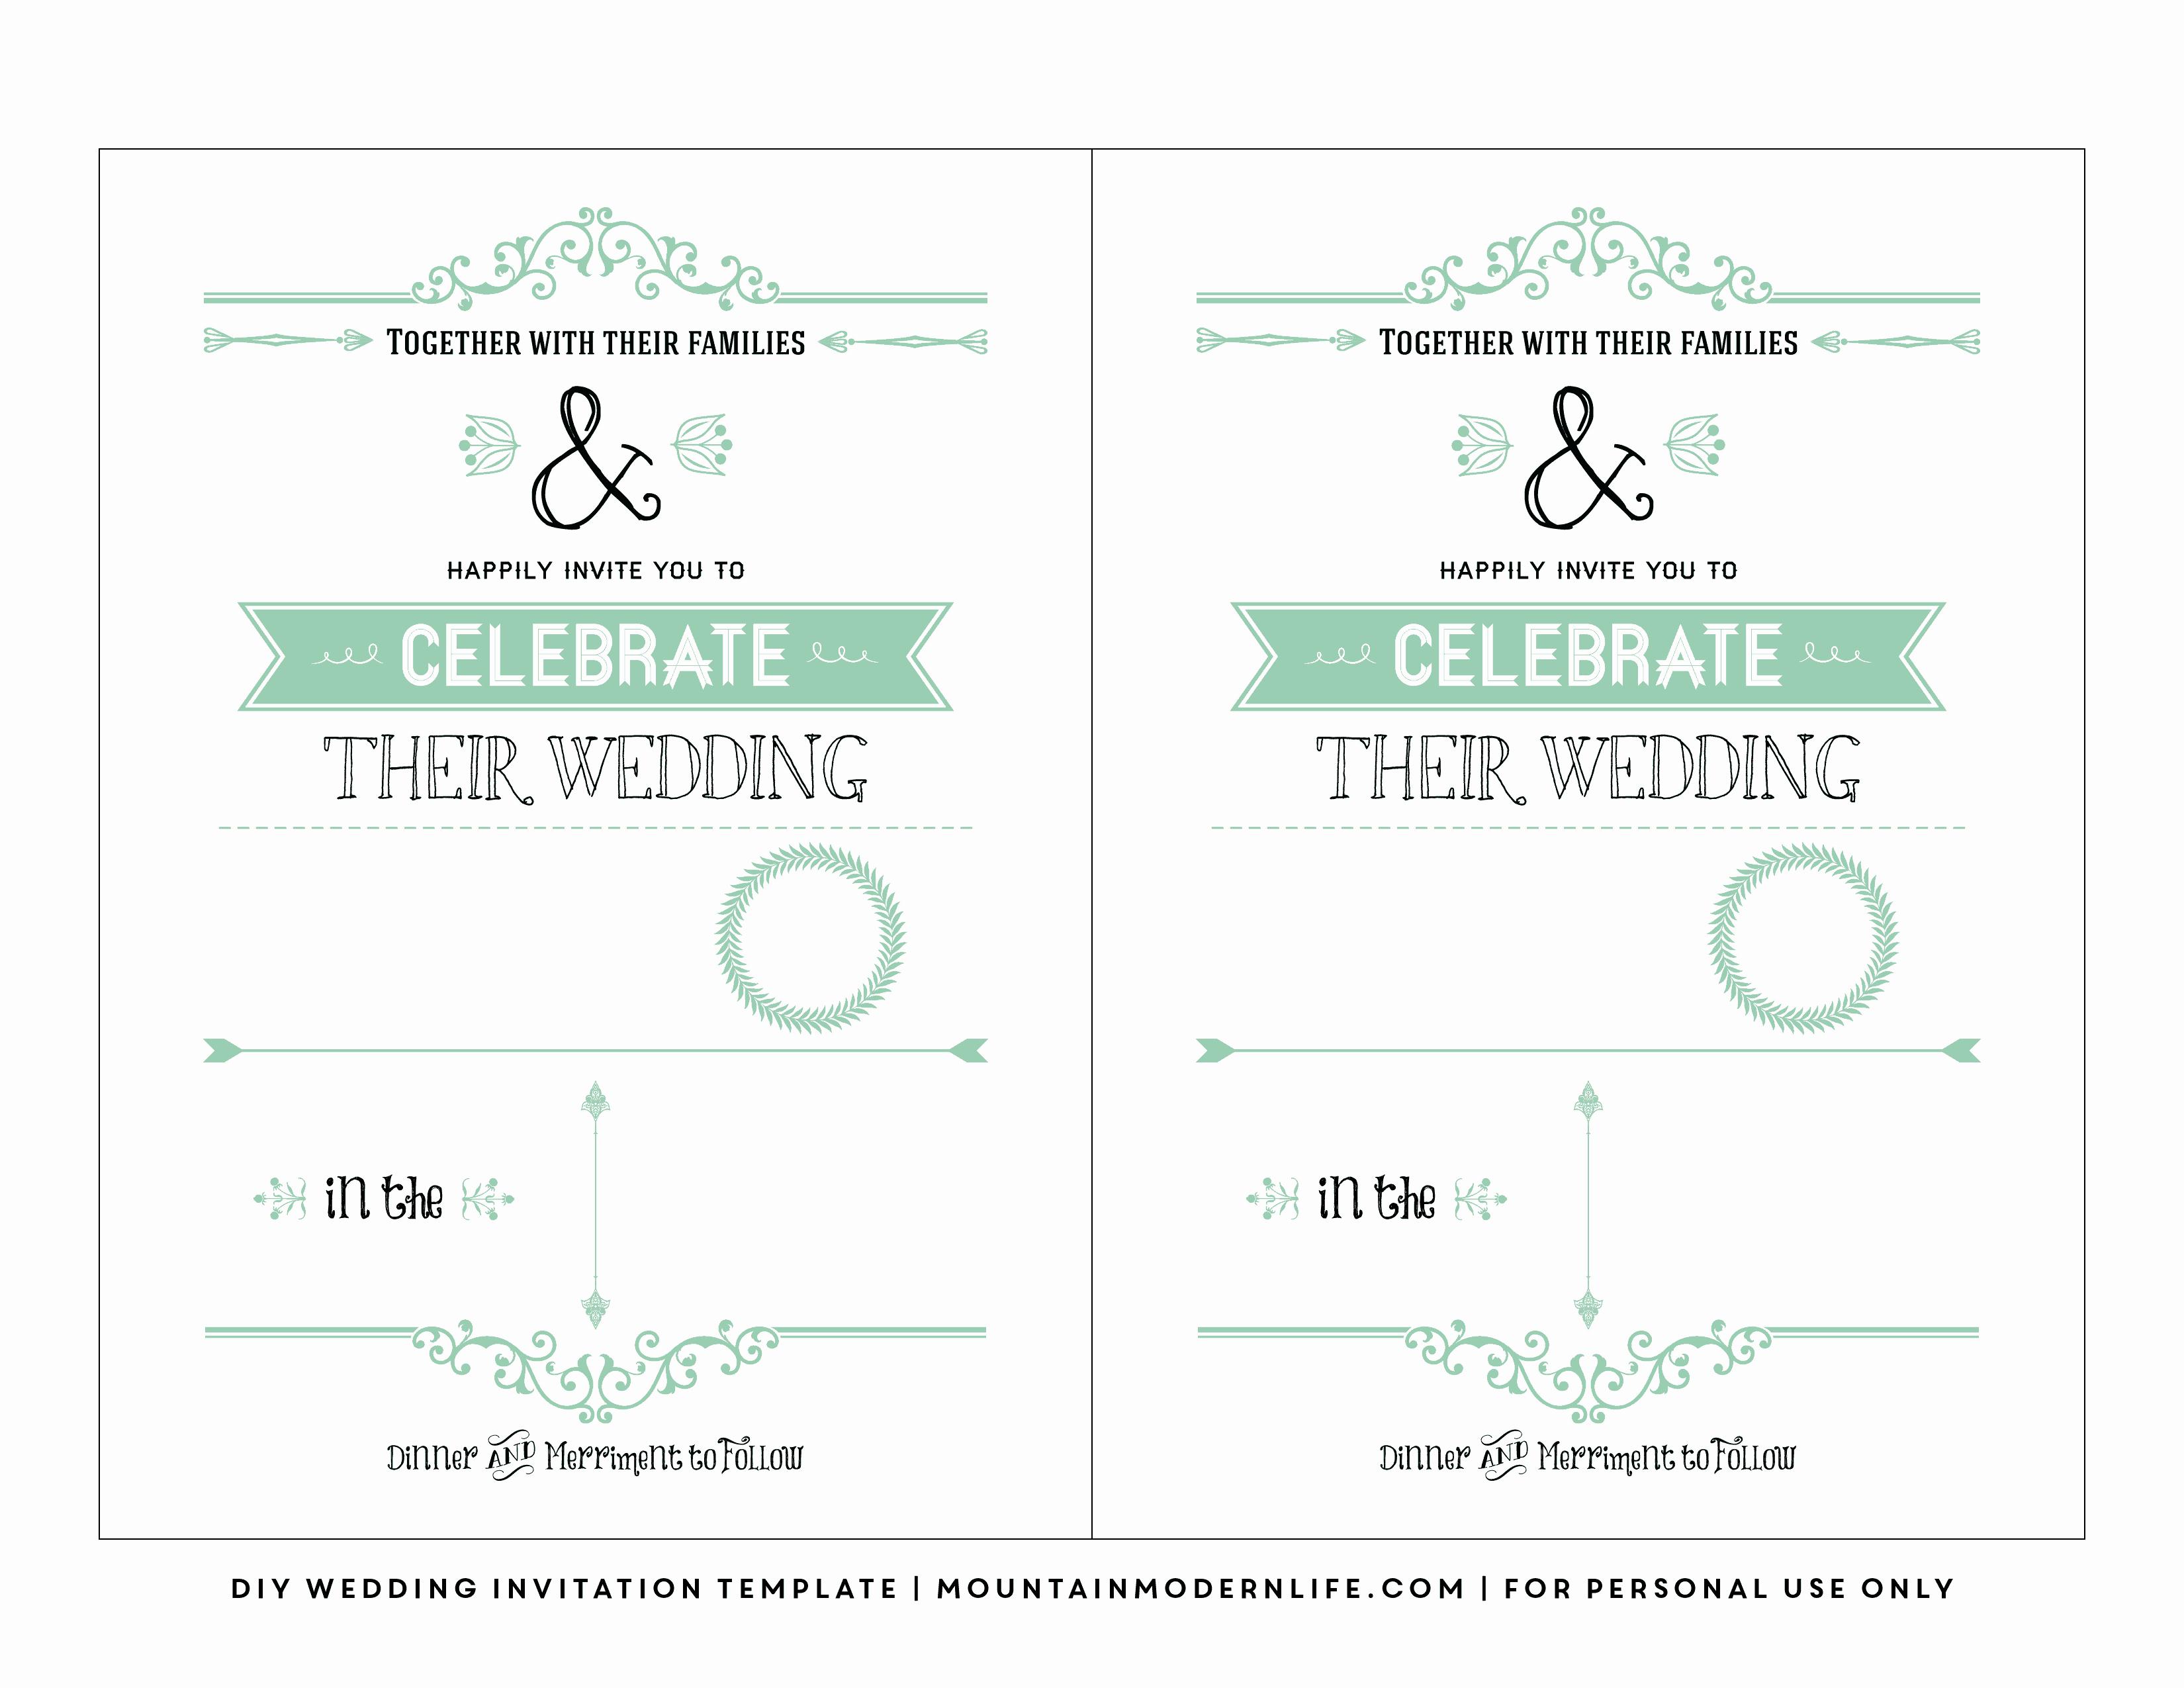 Wedding Invitation Template for Word Unique Free Wedding Invitation Template